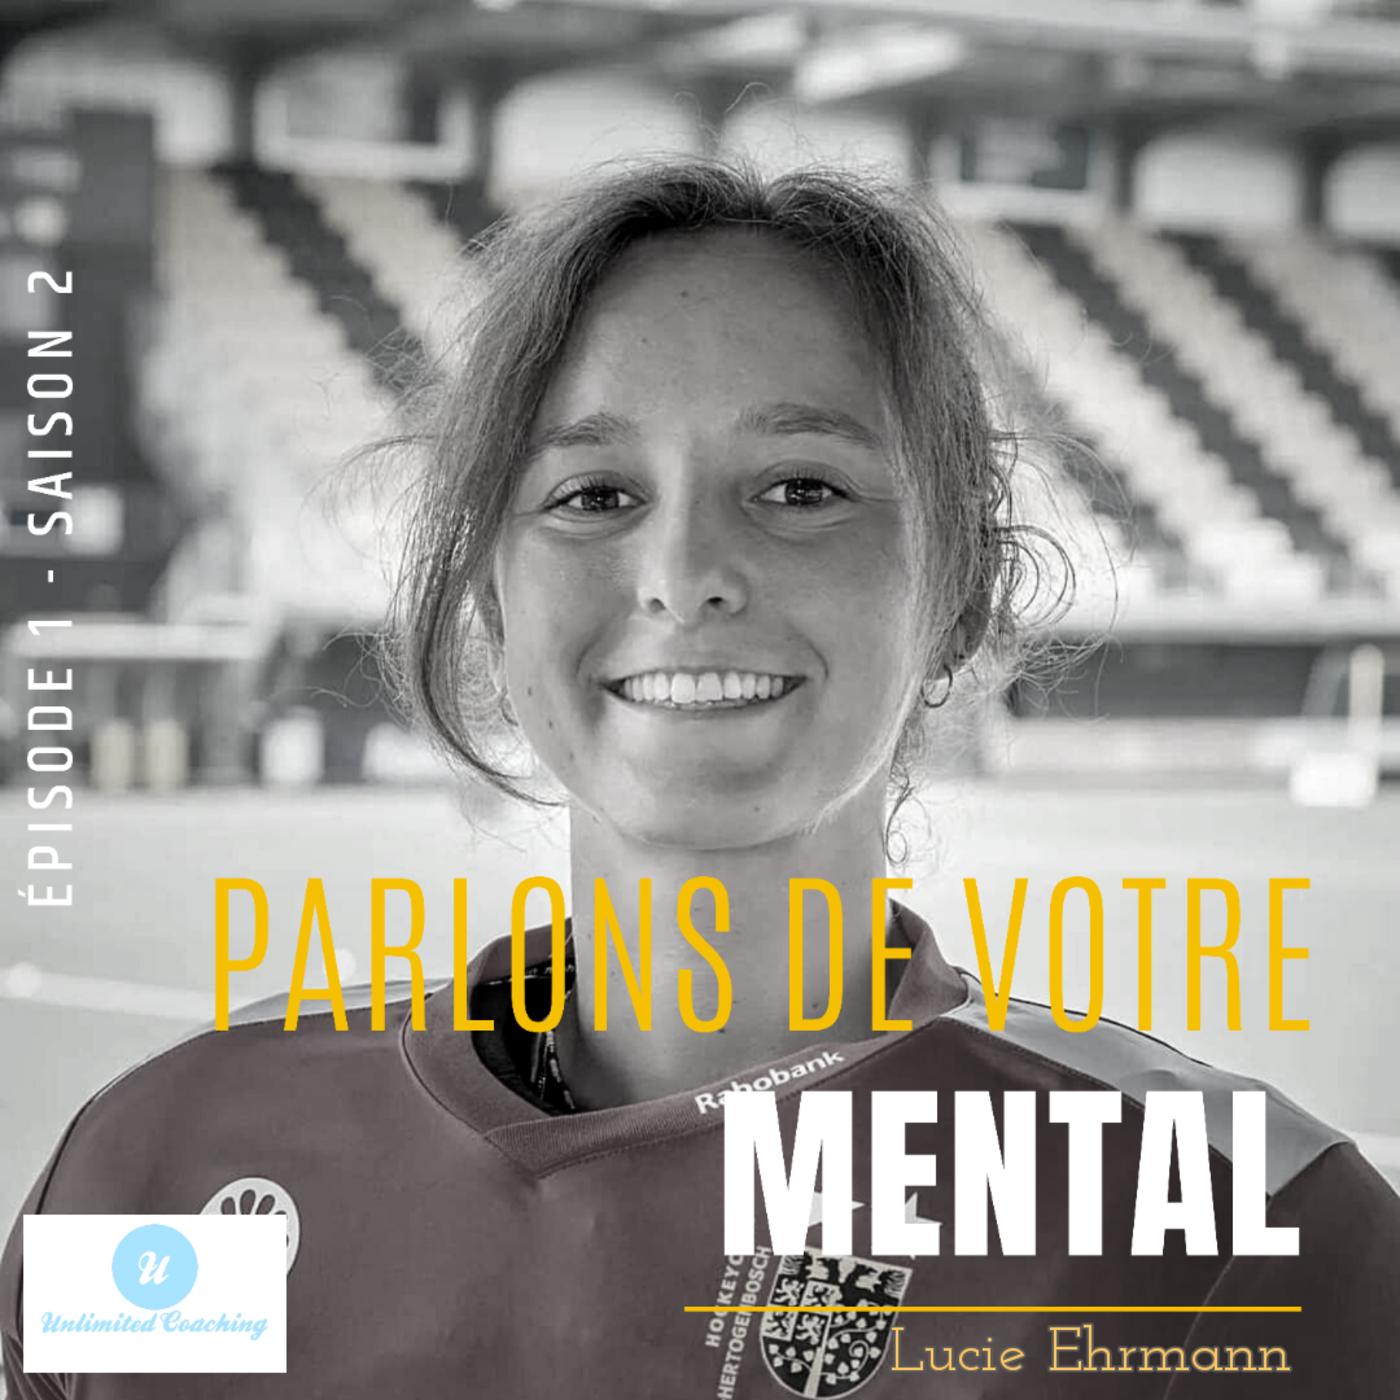 Lucie Ehrmann 🏑- Athlète international française de Hockey sur gazon